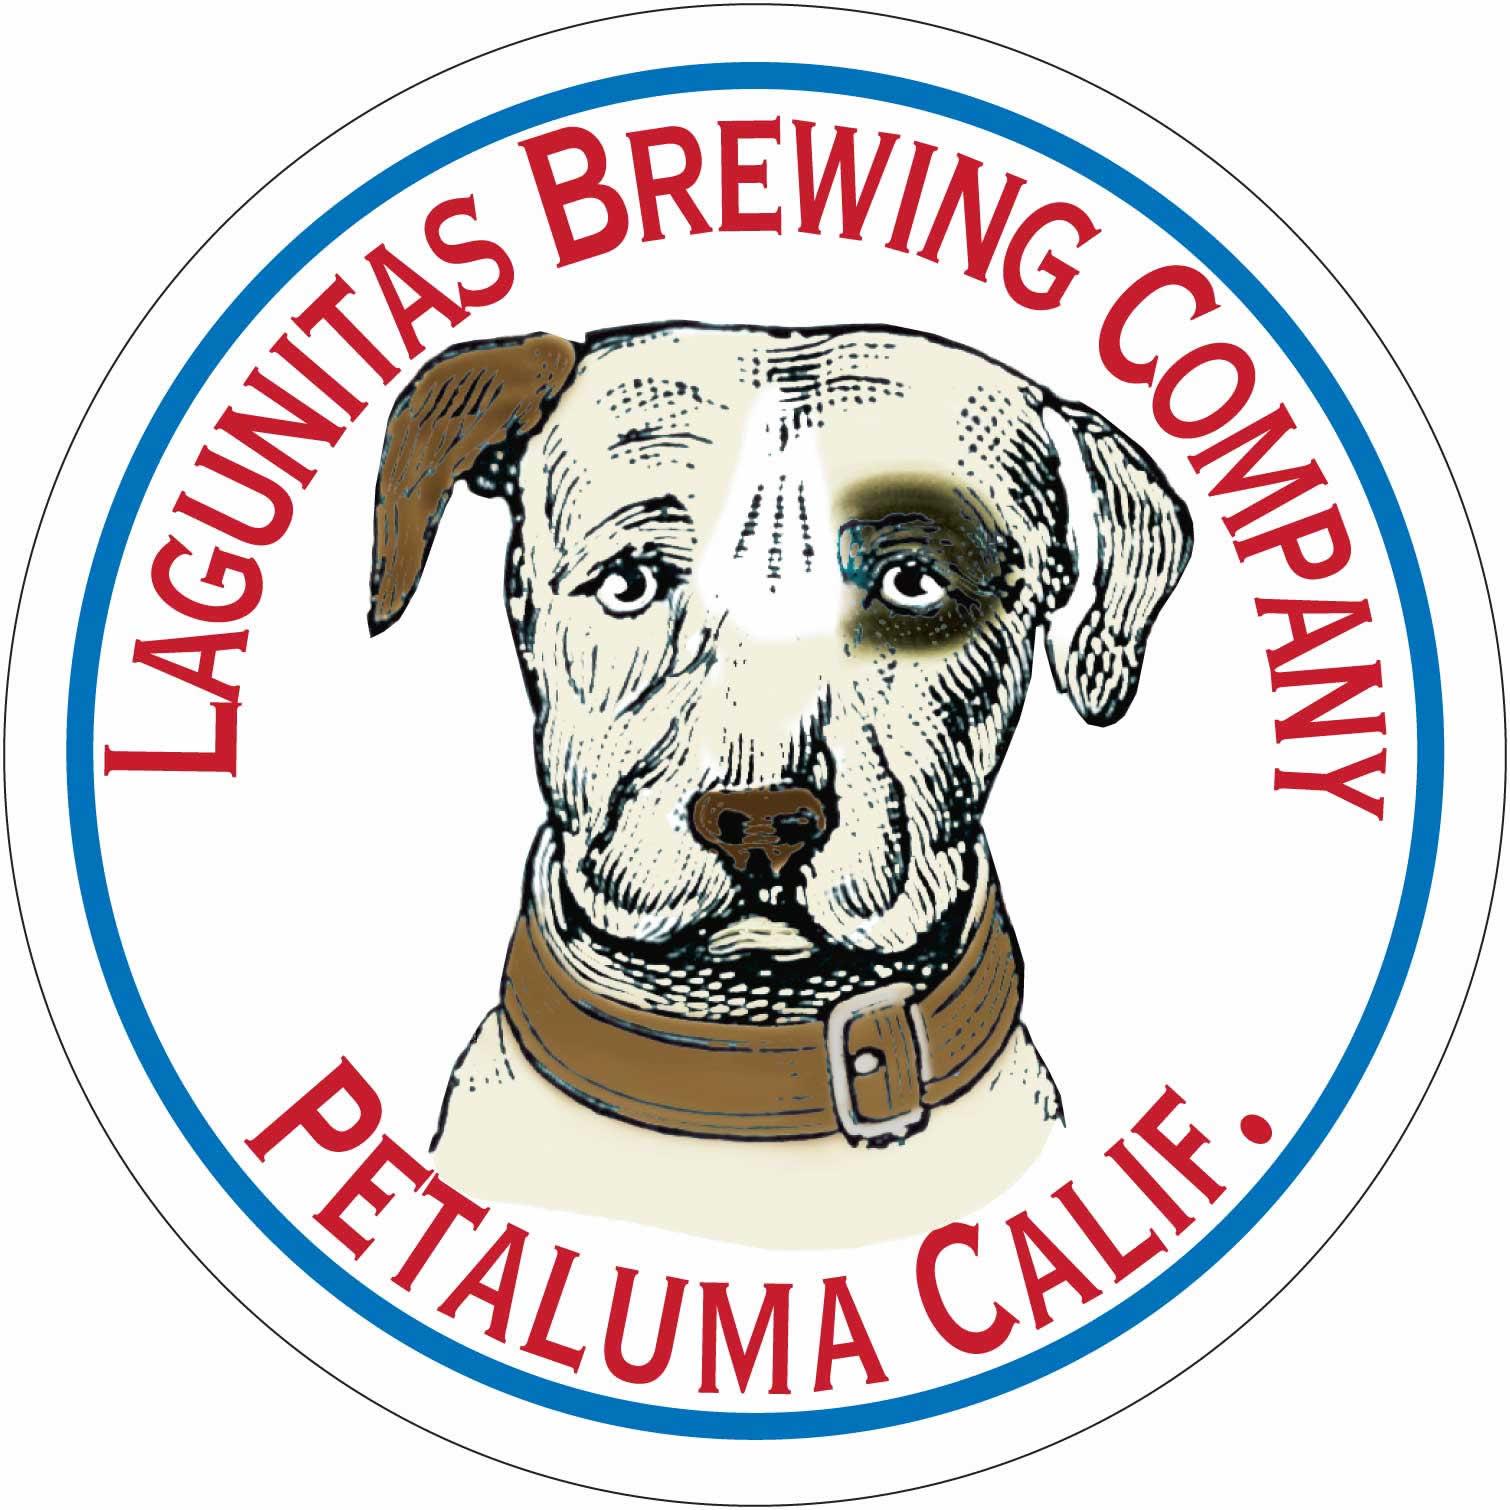 Image result for Lagunitas Brewing Company